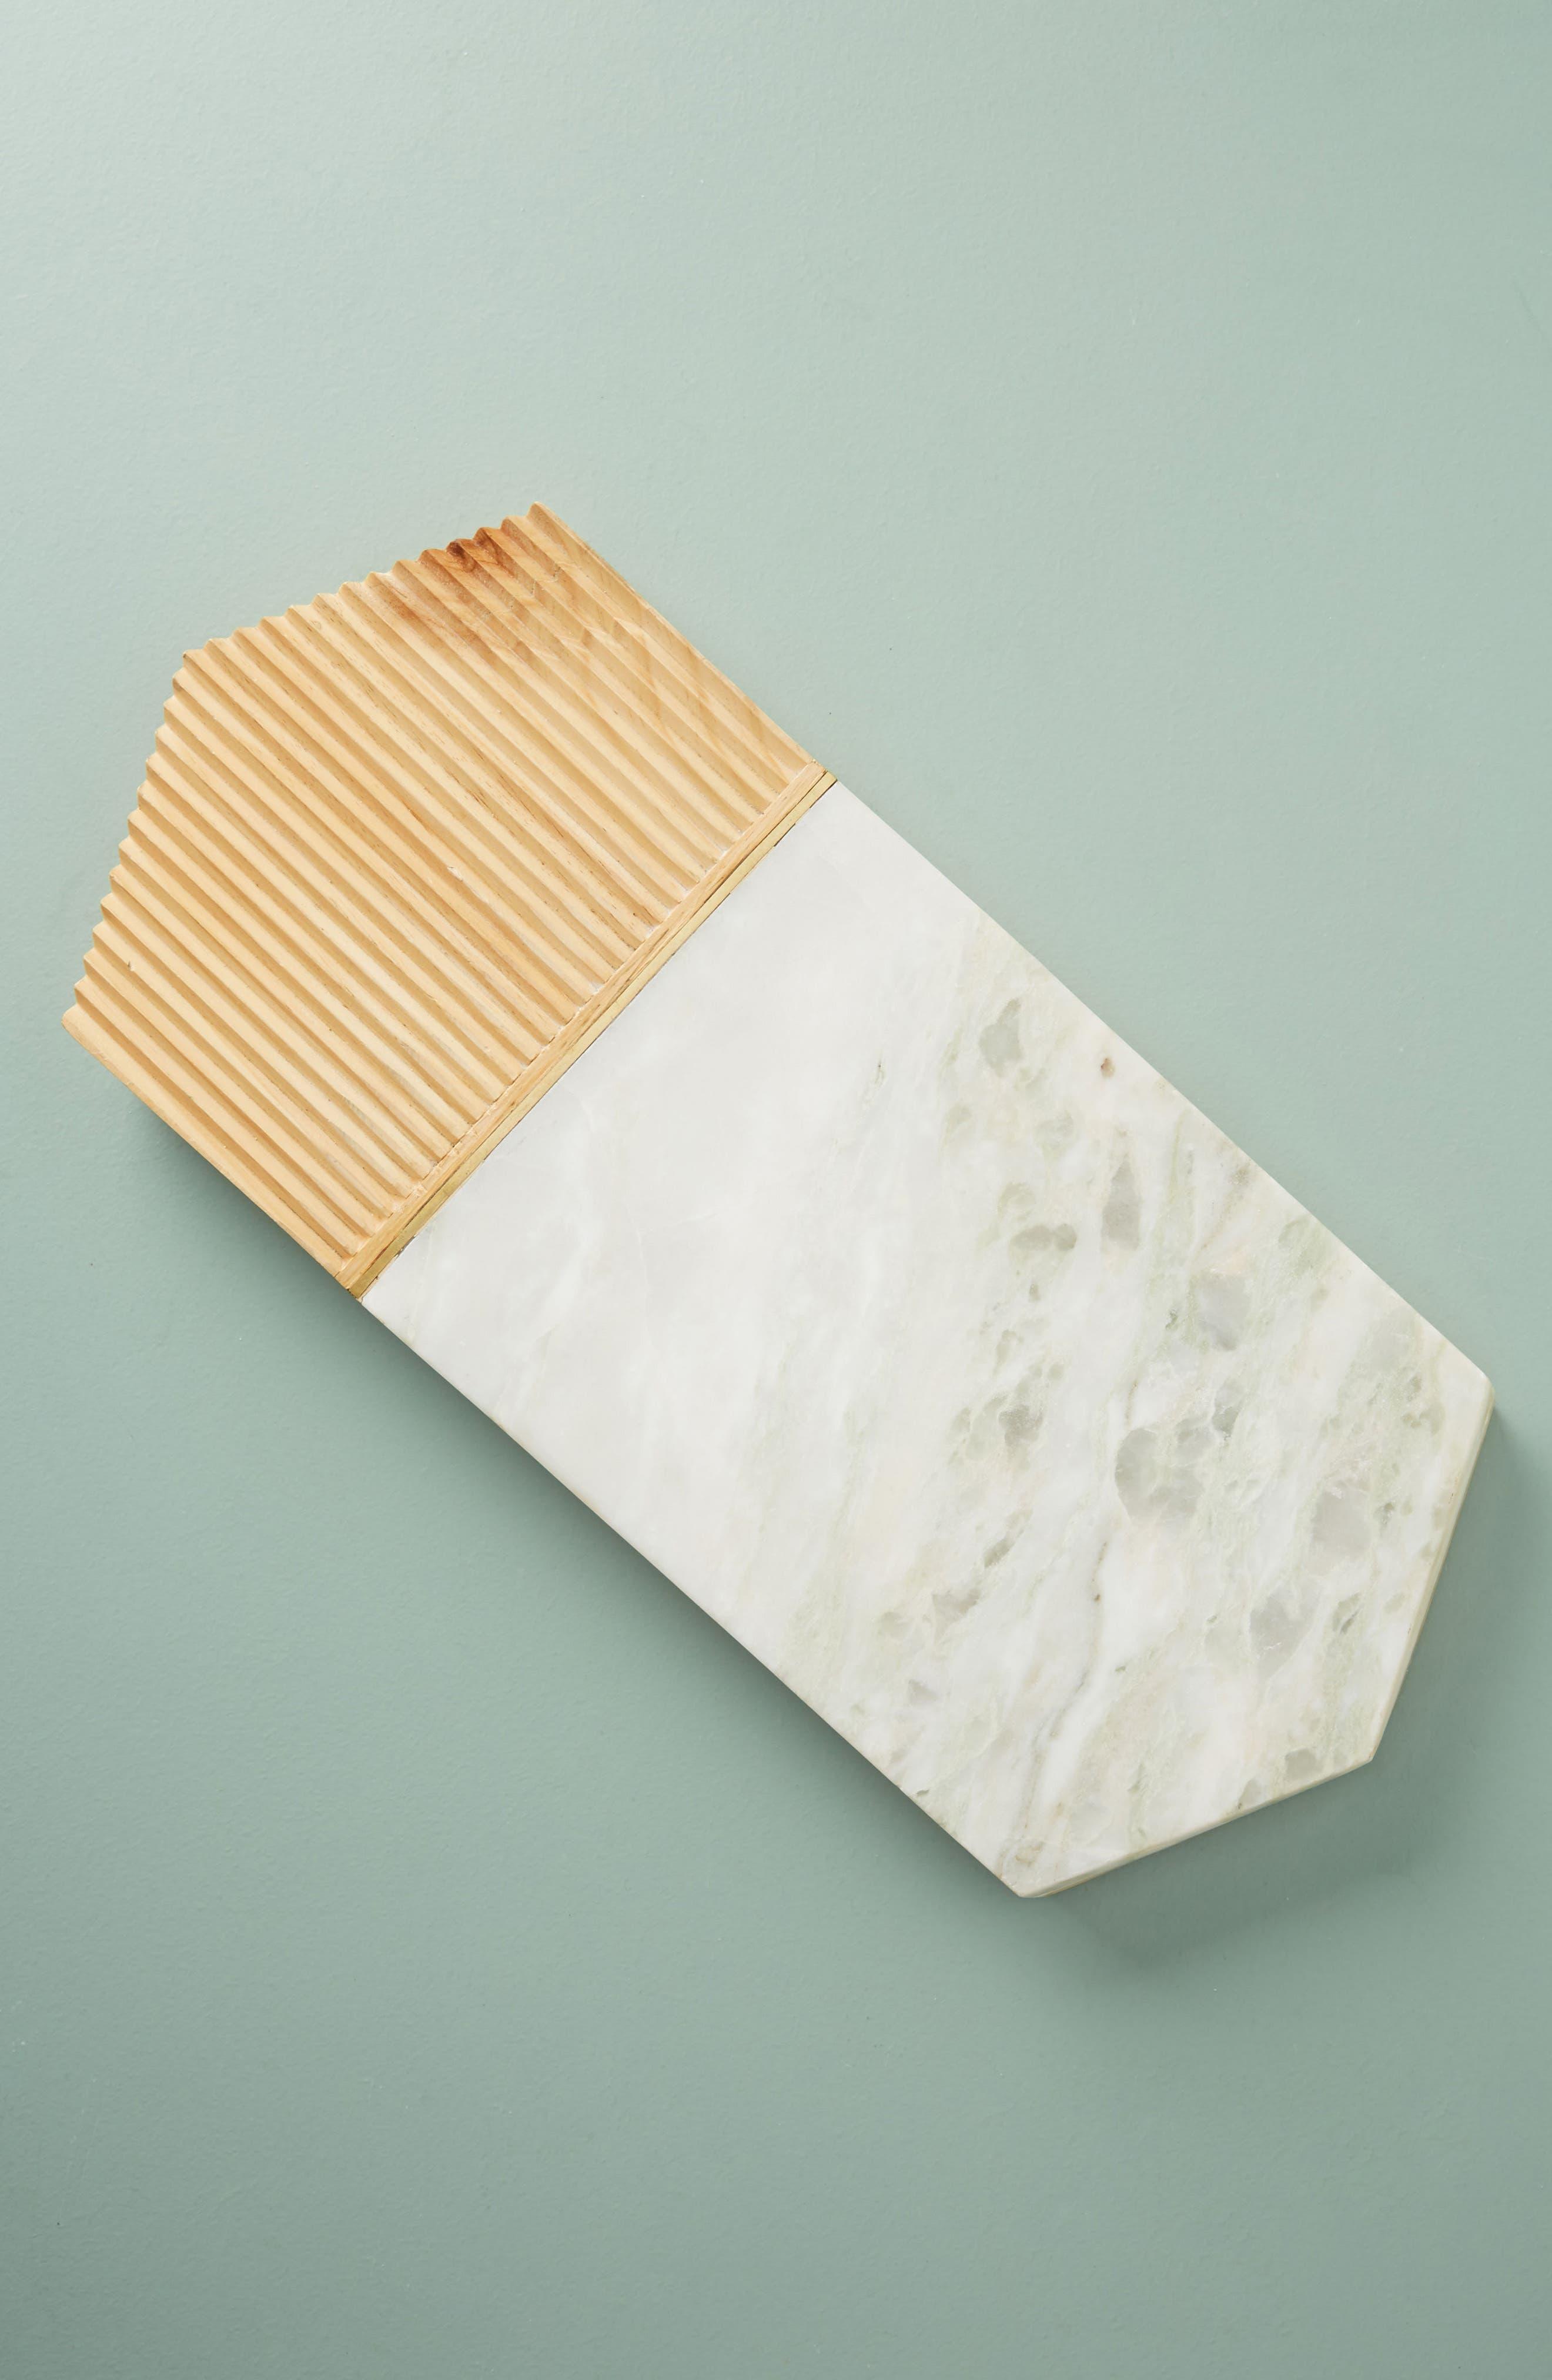 Karala Pinewood & Marble Cheese Board,                         Main,                         color, White